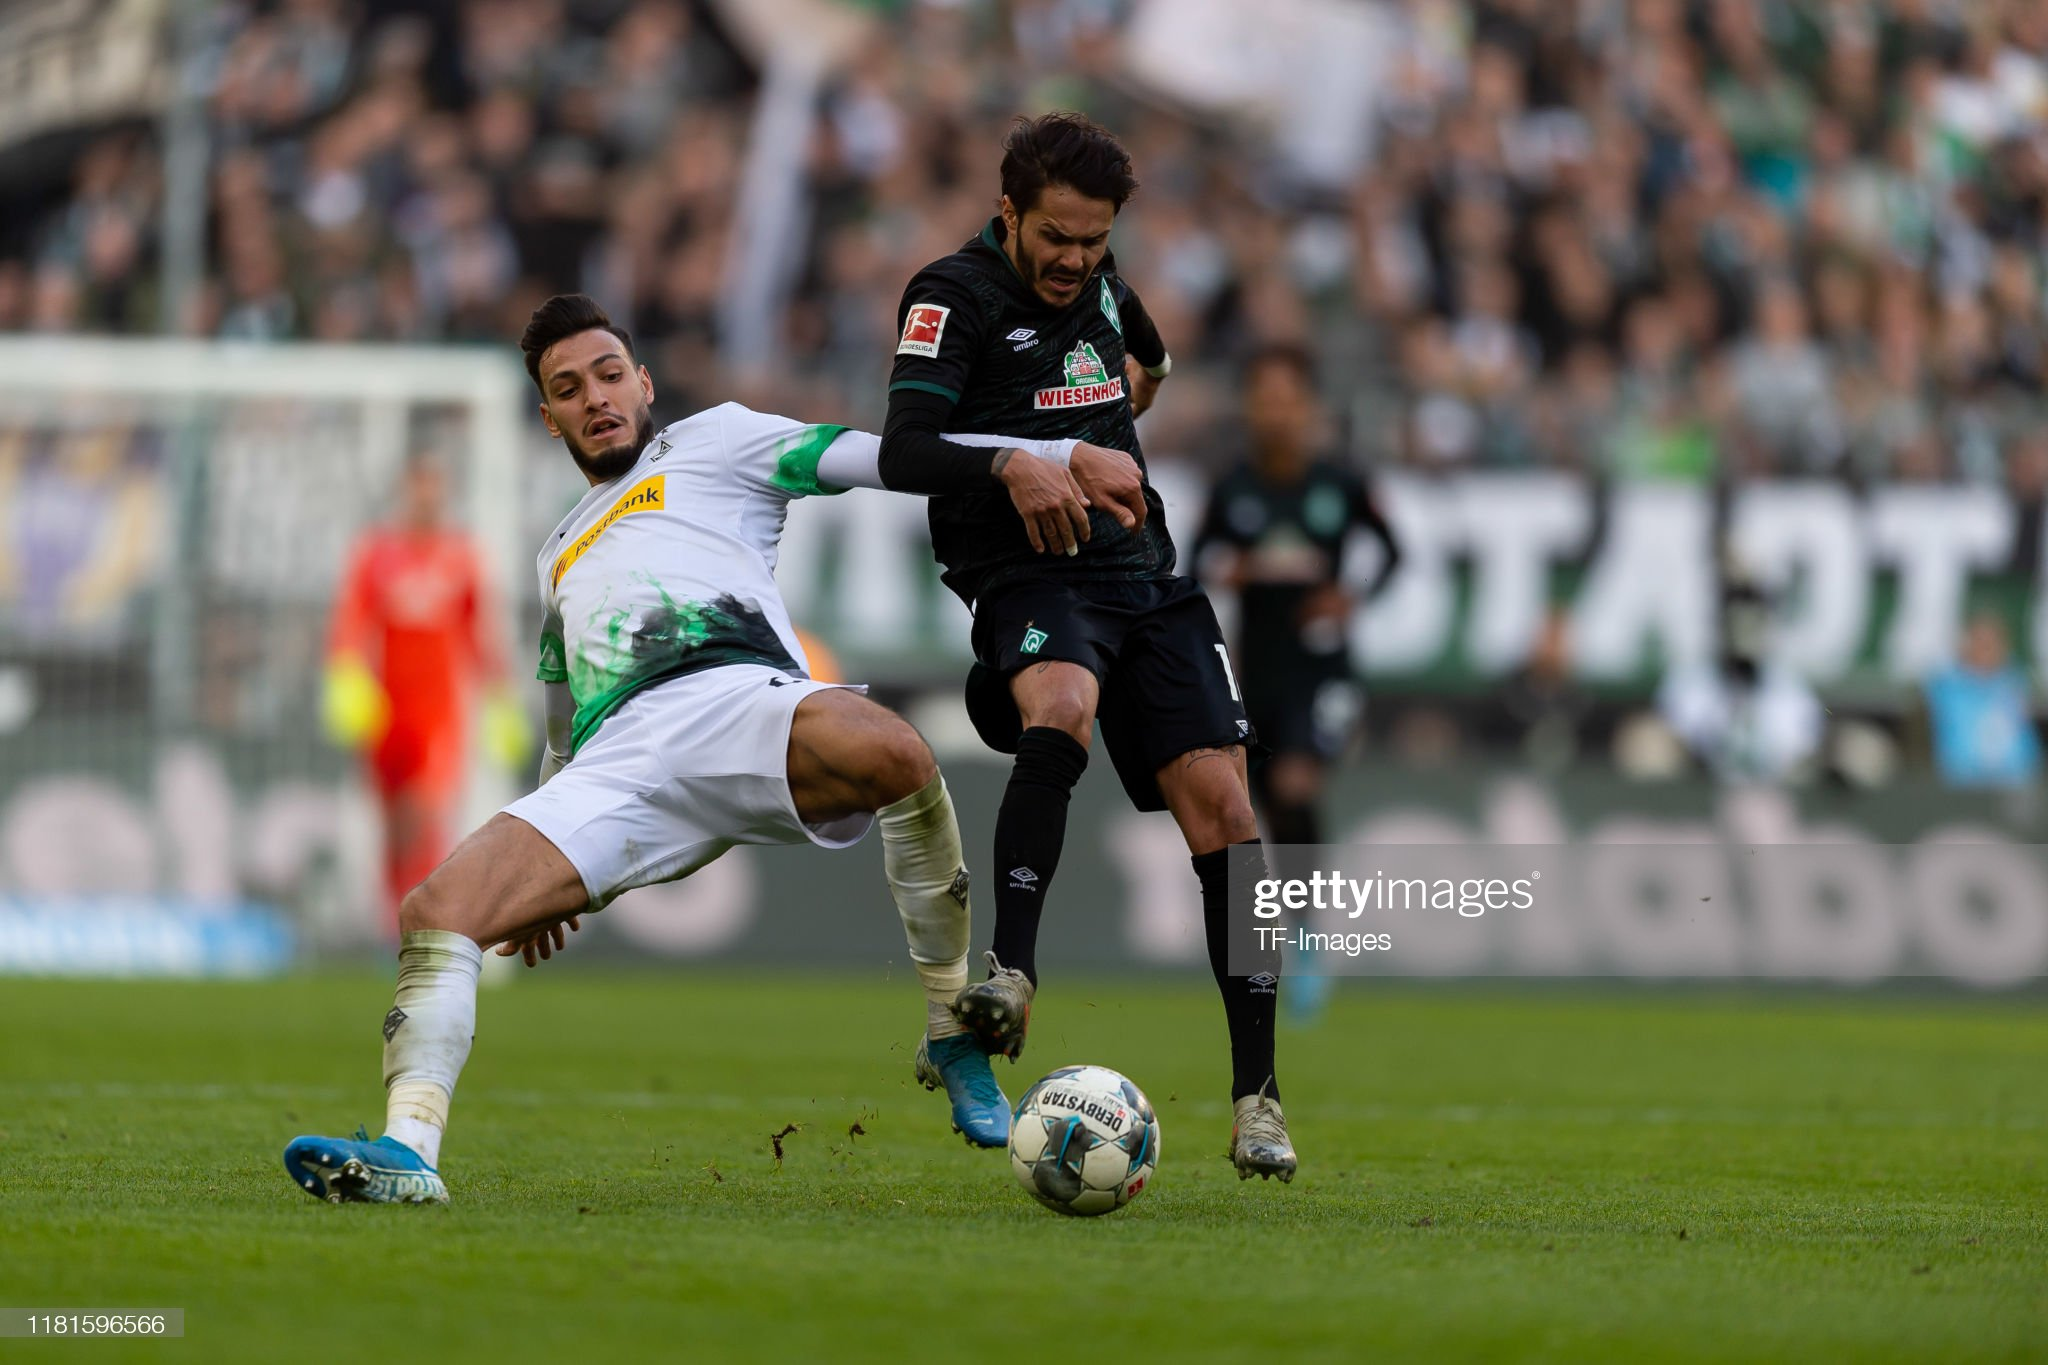 Werder Bremen v Monchengladbach Preview, prediction and odds